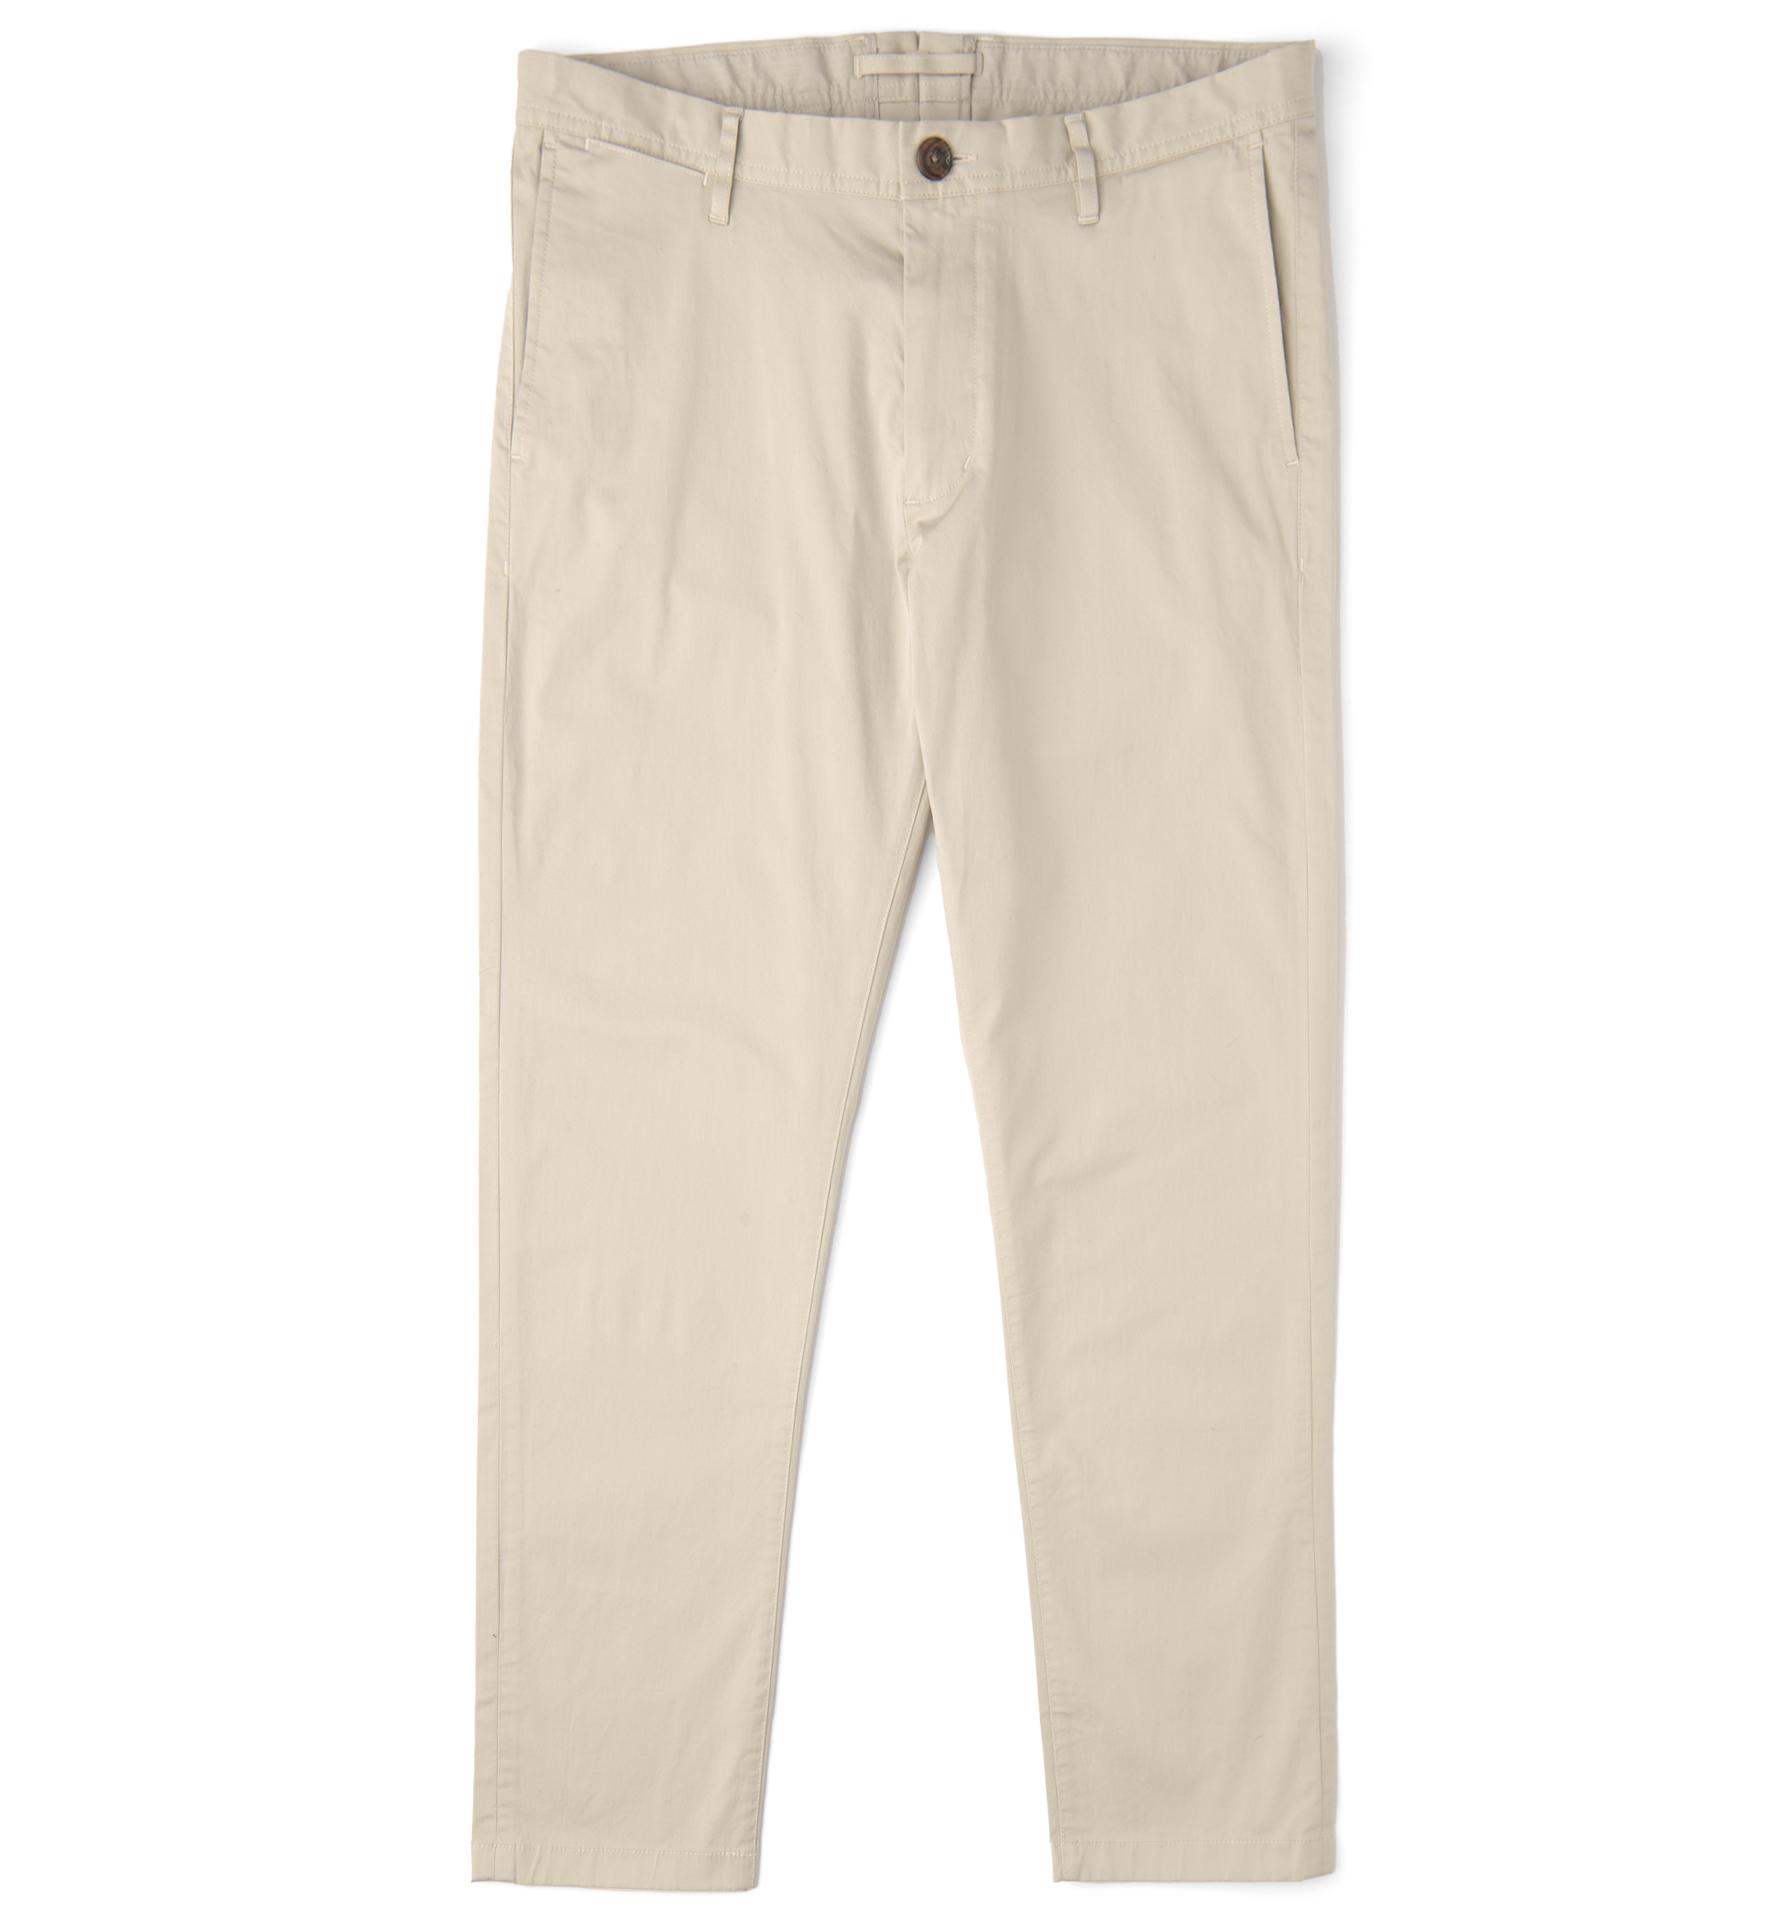 Zoom Image of Bowery Beige Lightweight Stretch Cotton Twill Chino